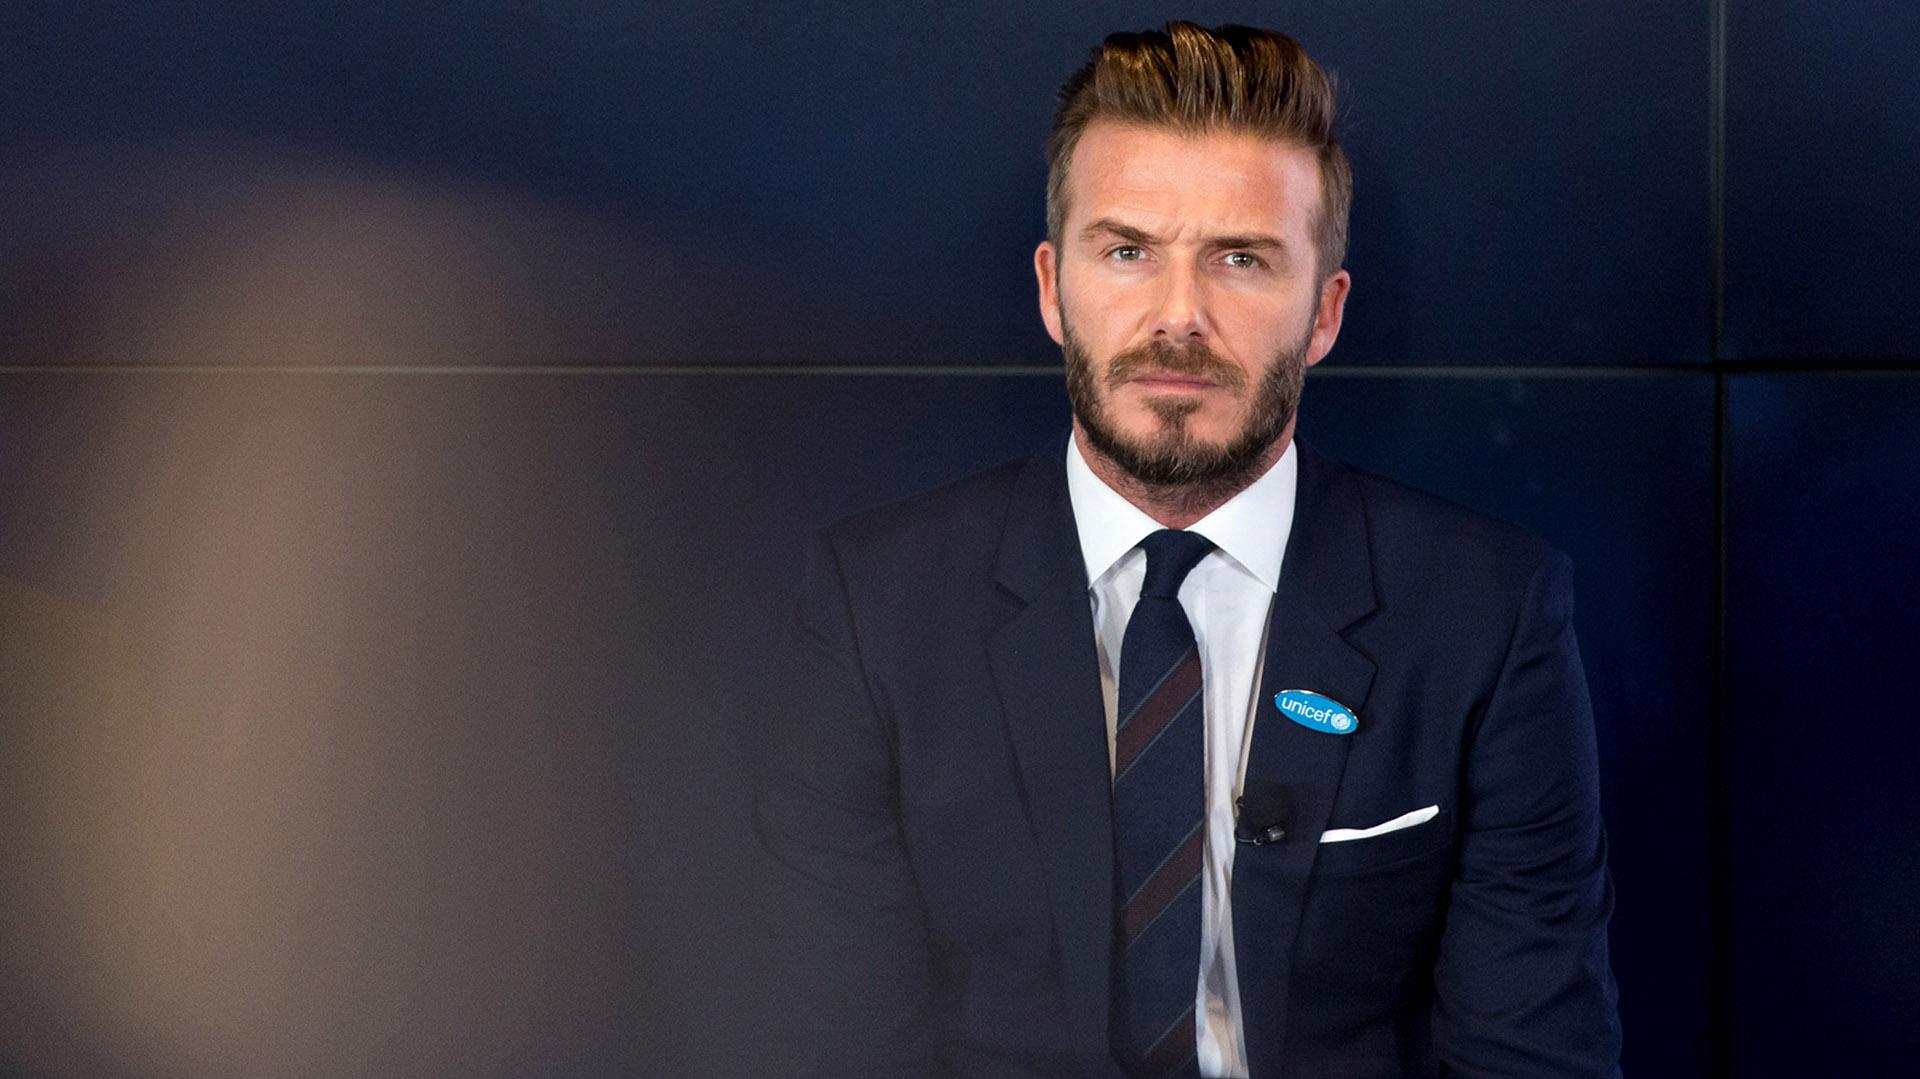 David Beckham culminó su carrera en el Paris Saint Germain en 2013 (Getty)